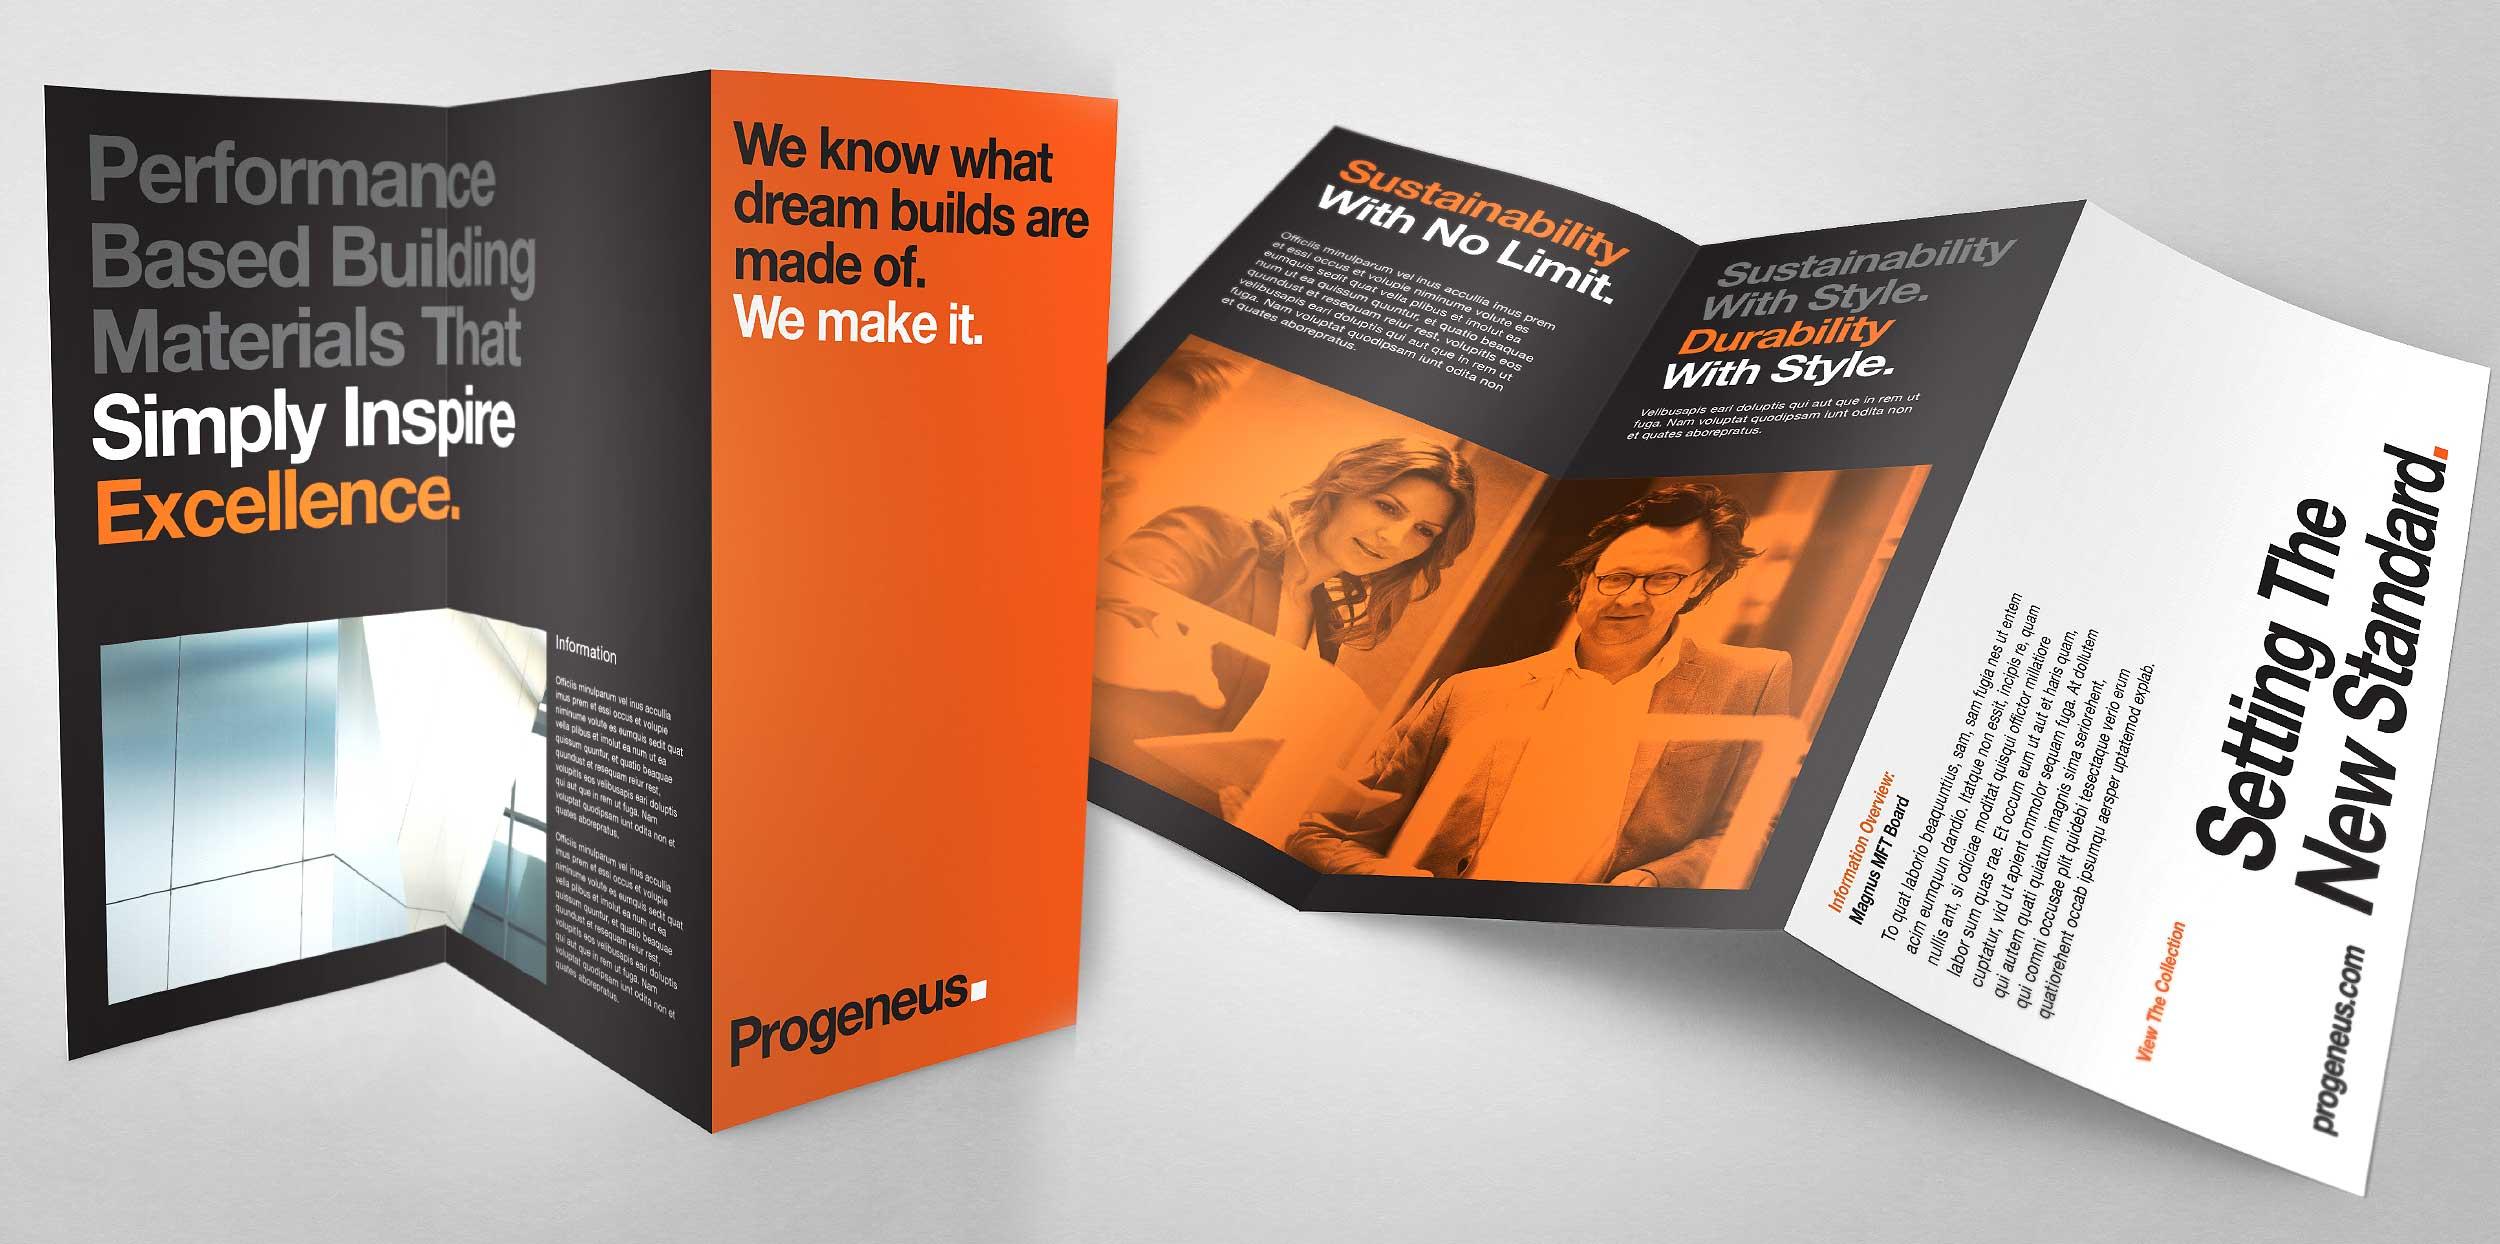 Handle-Branding-Progeneus-Construction_09.jpg